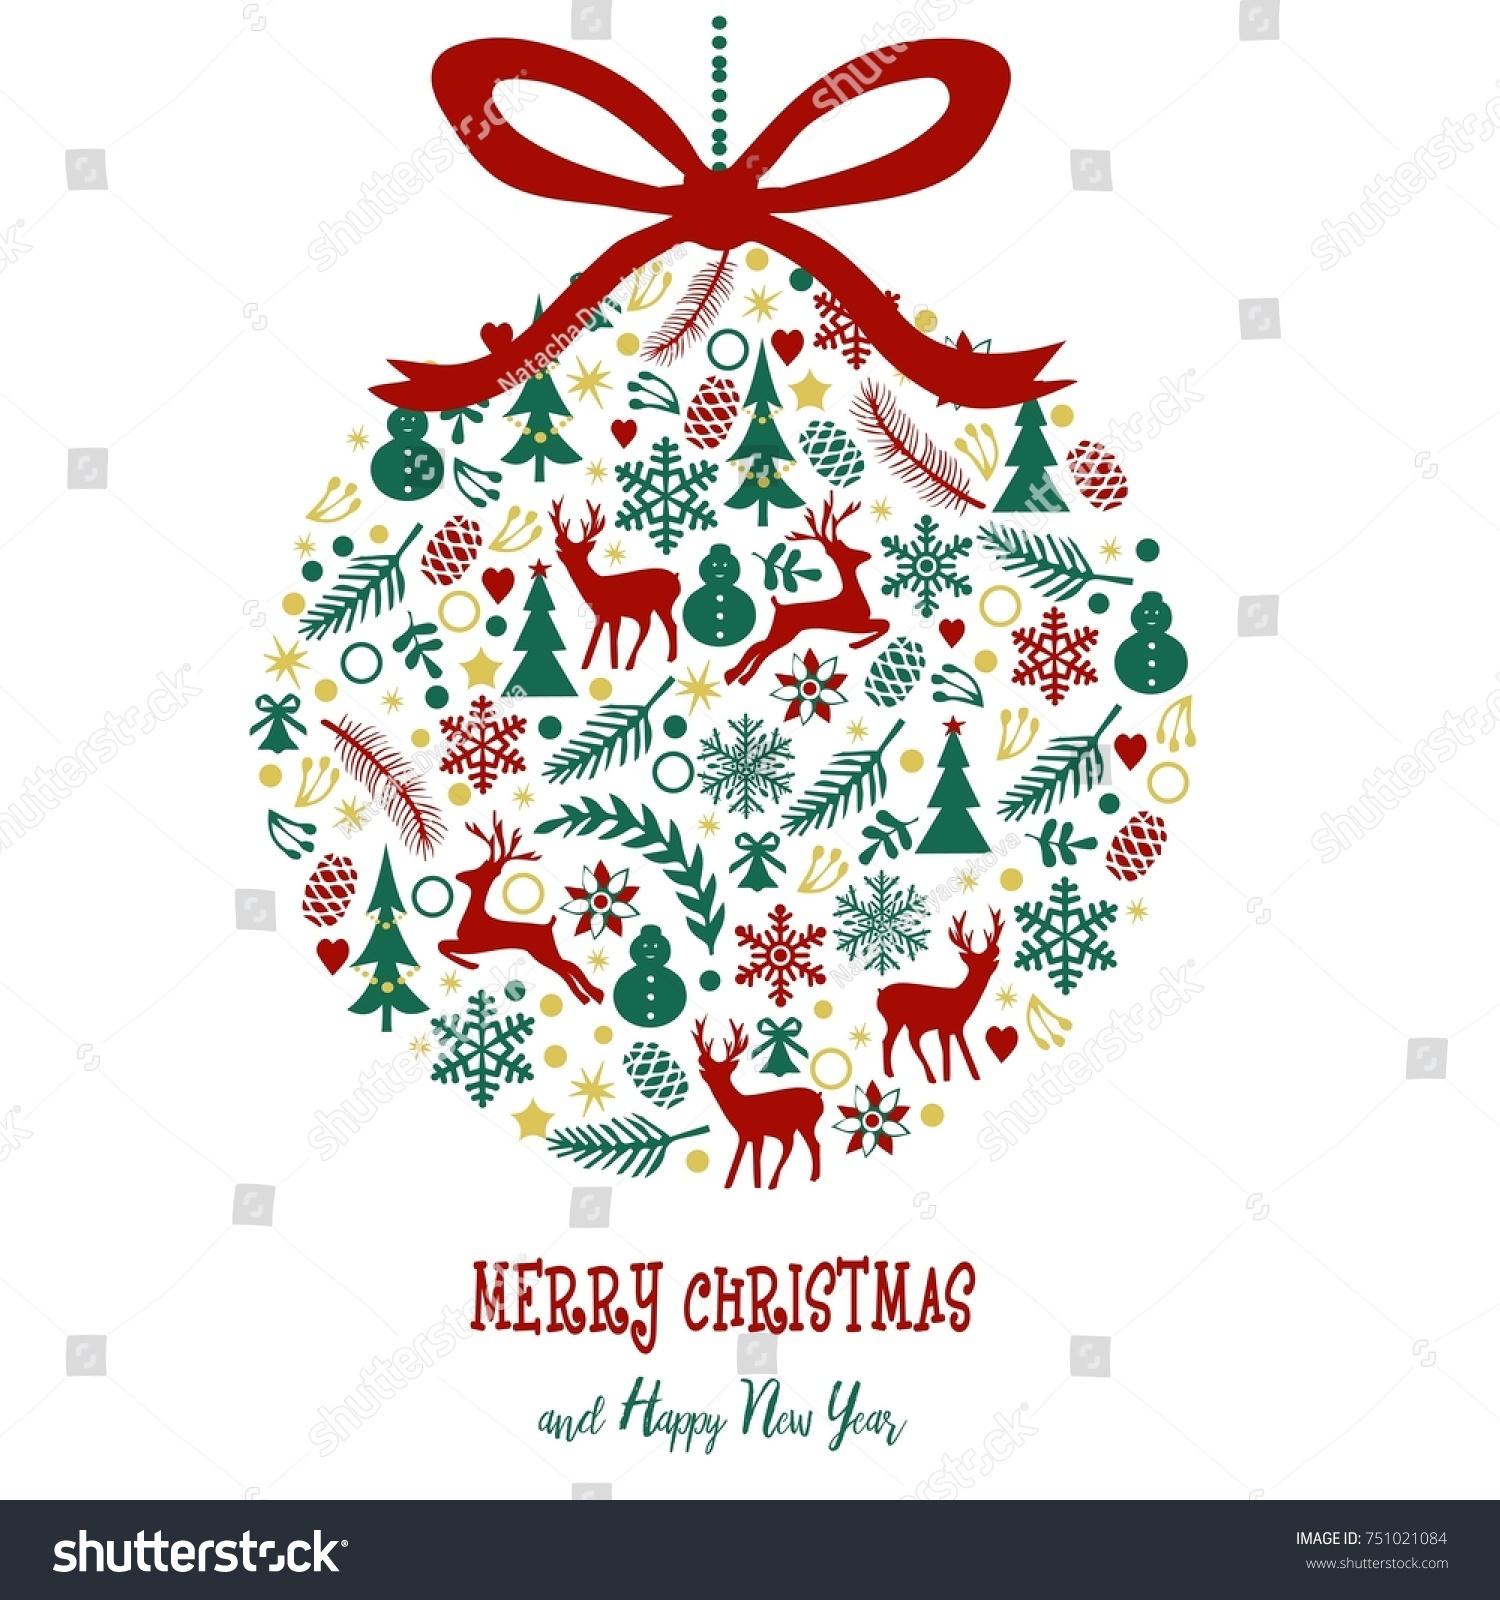 Merry Christmas Greeting Card Christmas Tree Stock Illustration ...